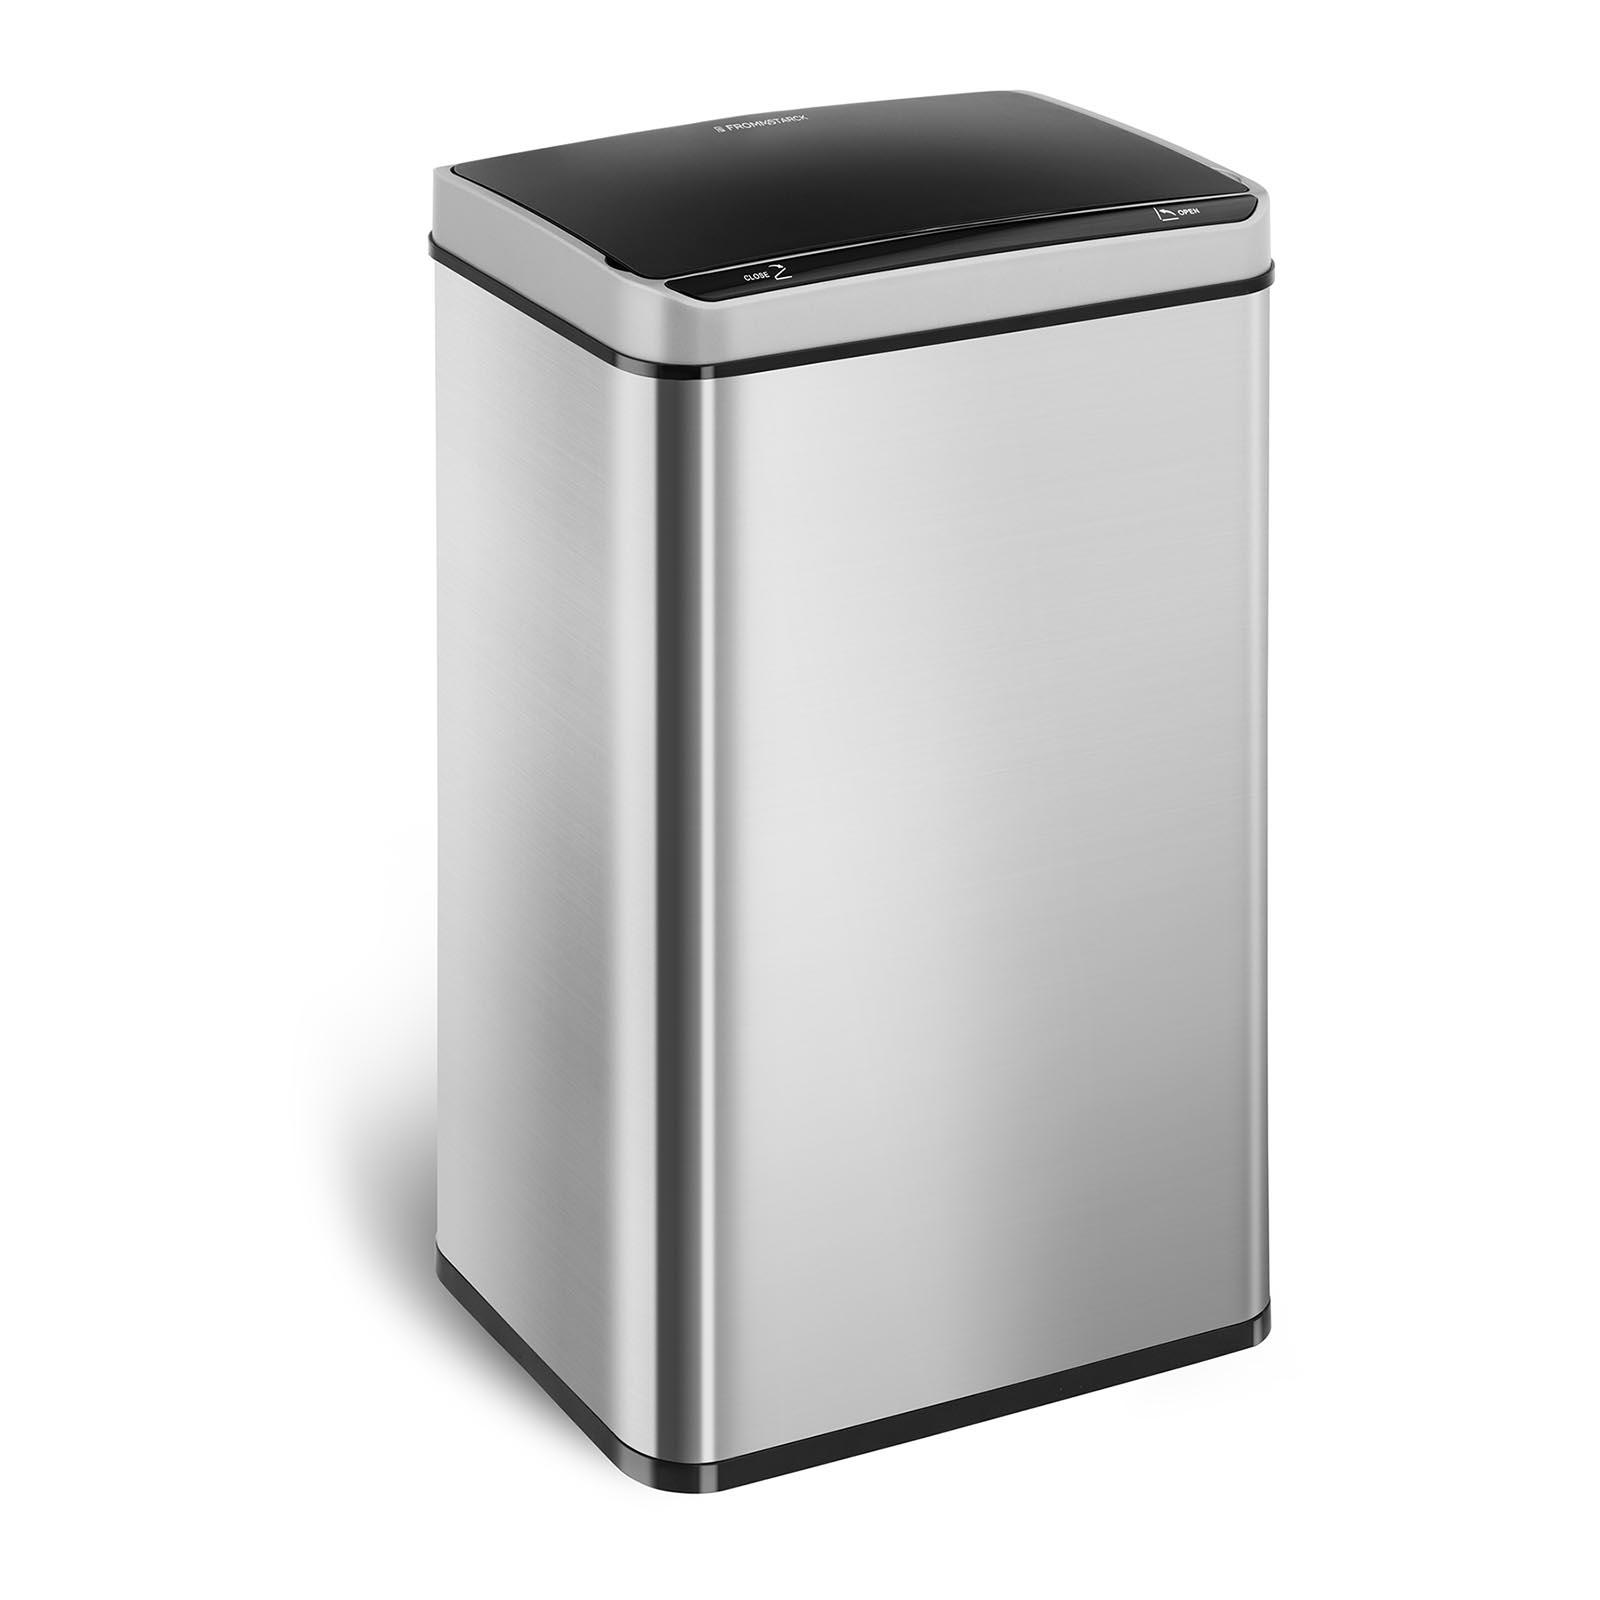 Cubo de basura con sensor